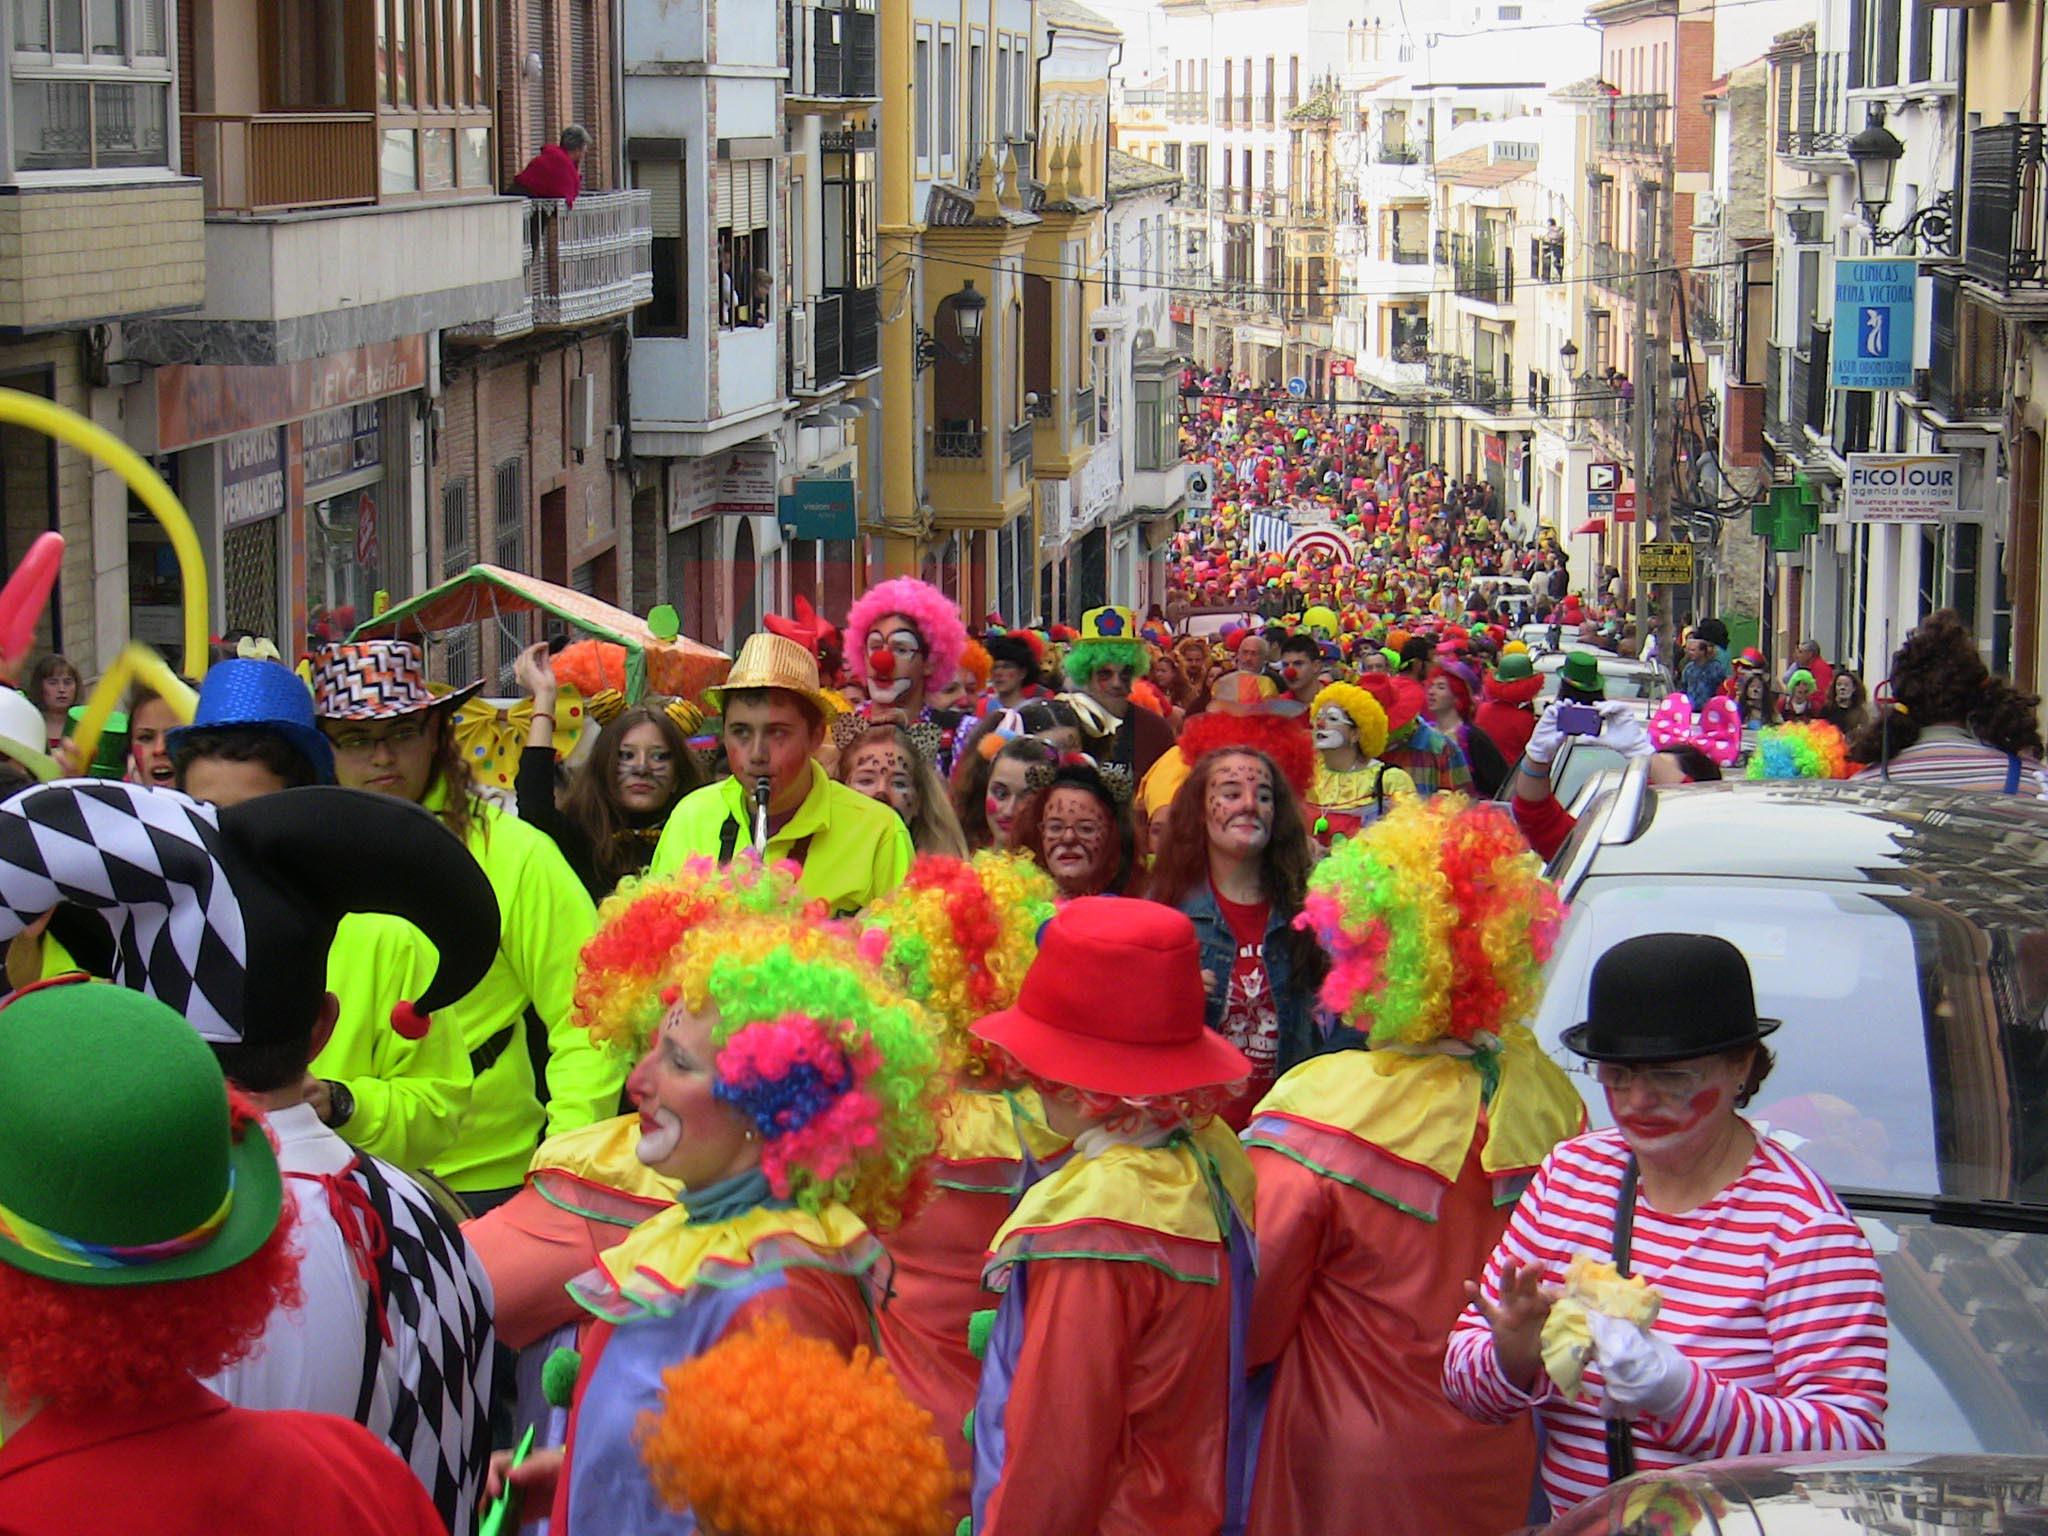 Rute sabor a Navidad carnaval festival temático